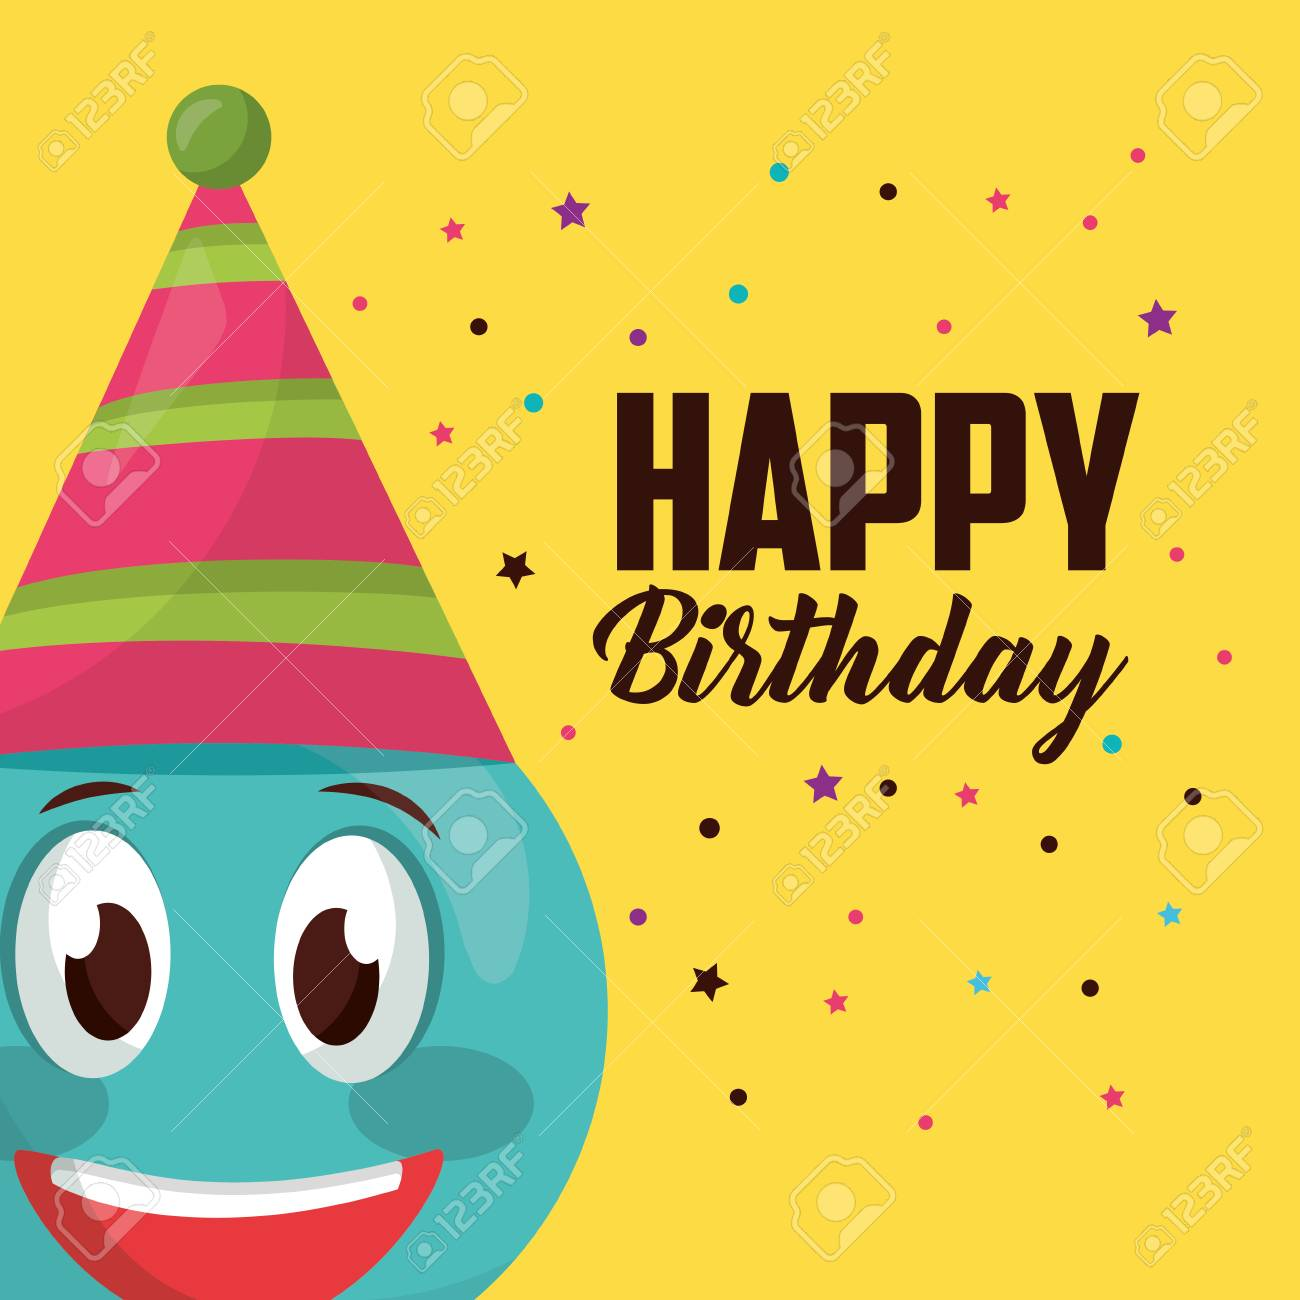 Happy Birthday Sign Celebration Emoji Smiling Party Hat Vector Illustration Stock